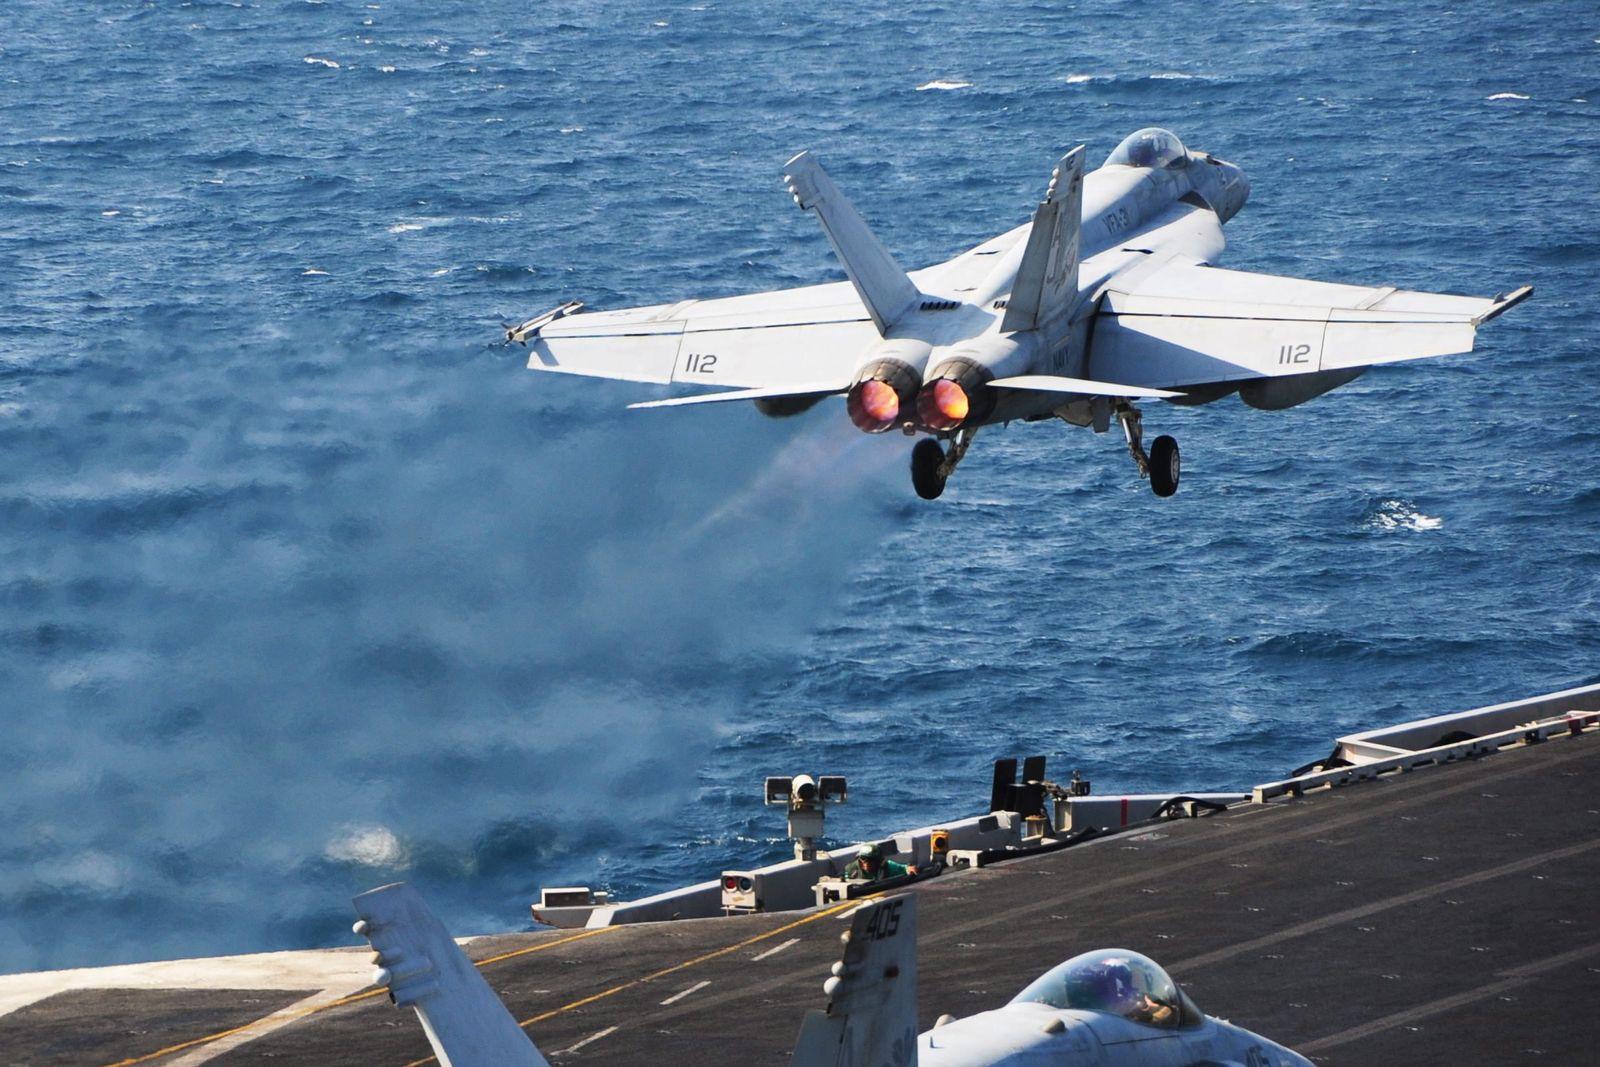 USS George HW Bush flight operations in the Arabian Gulf